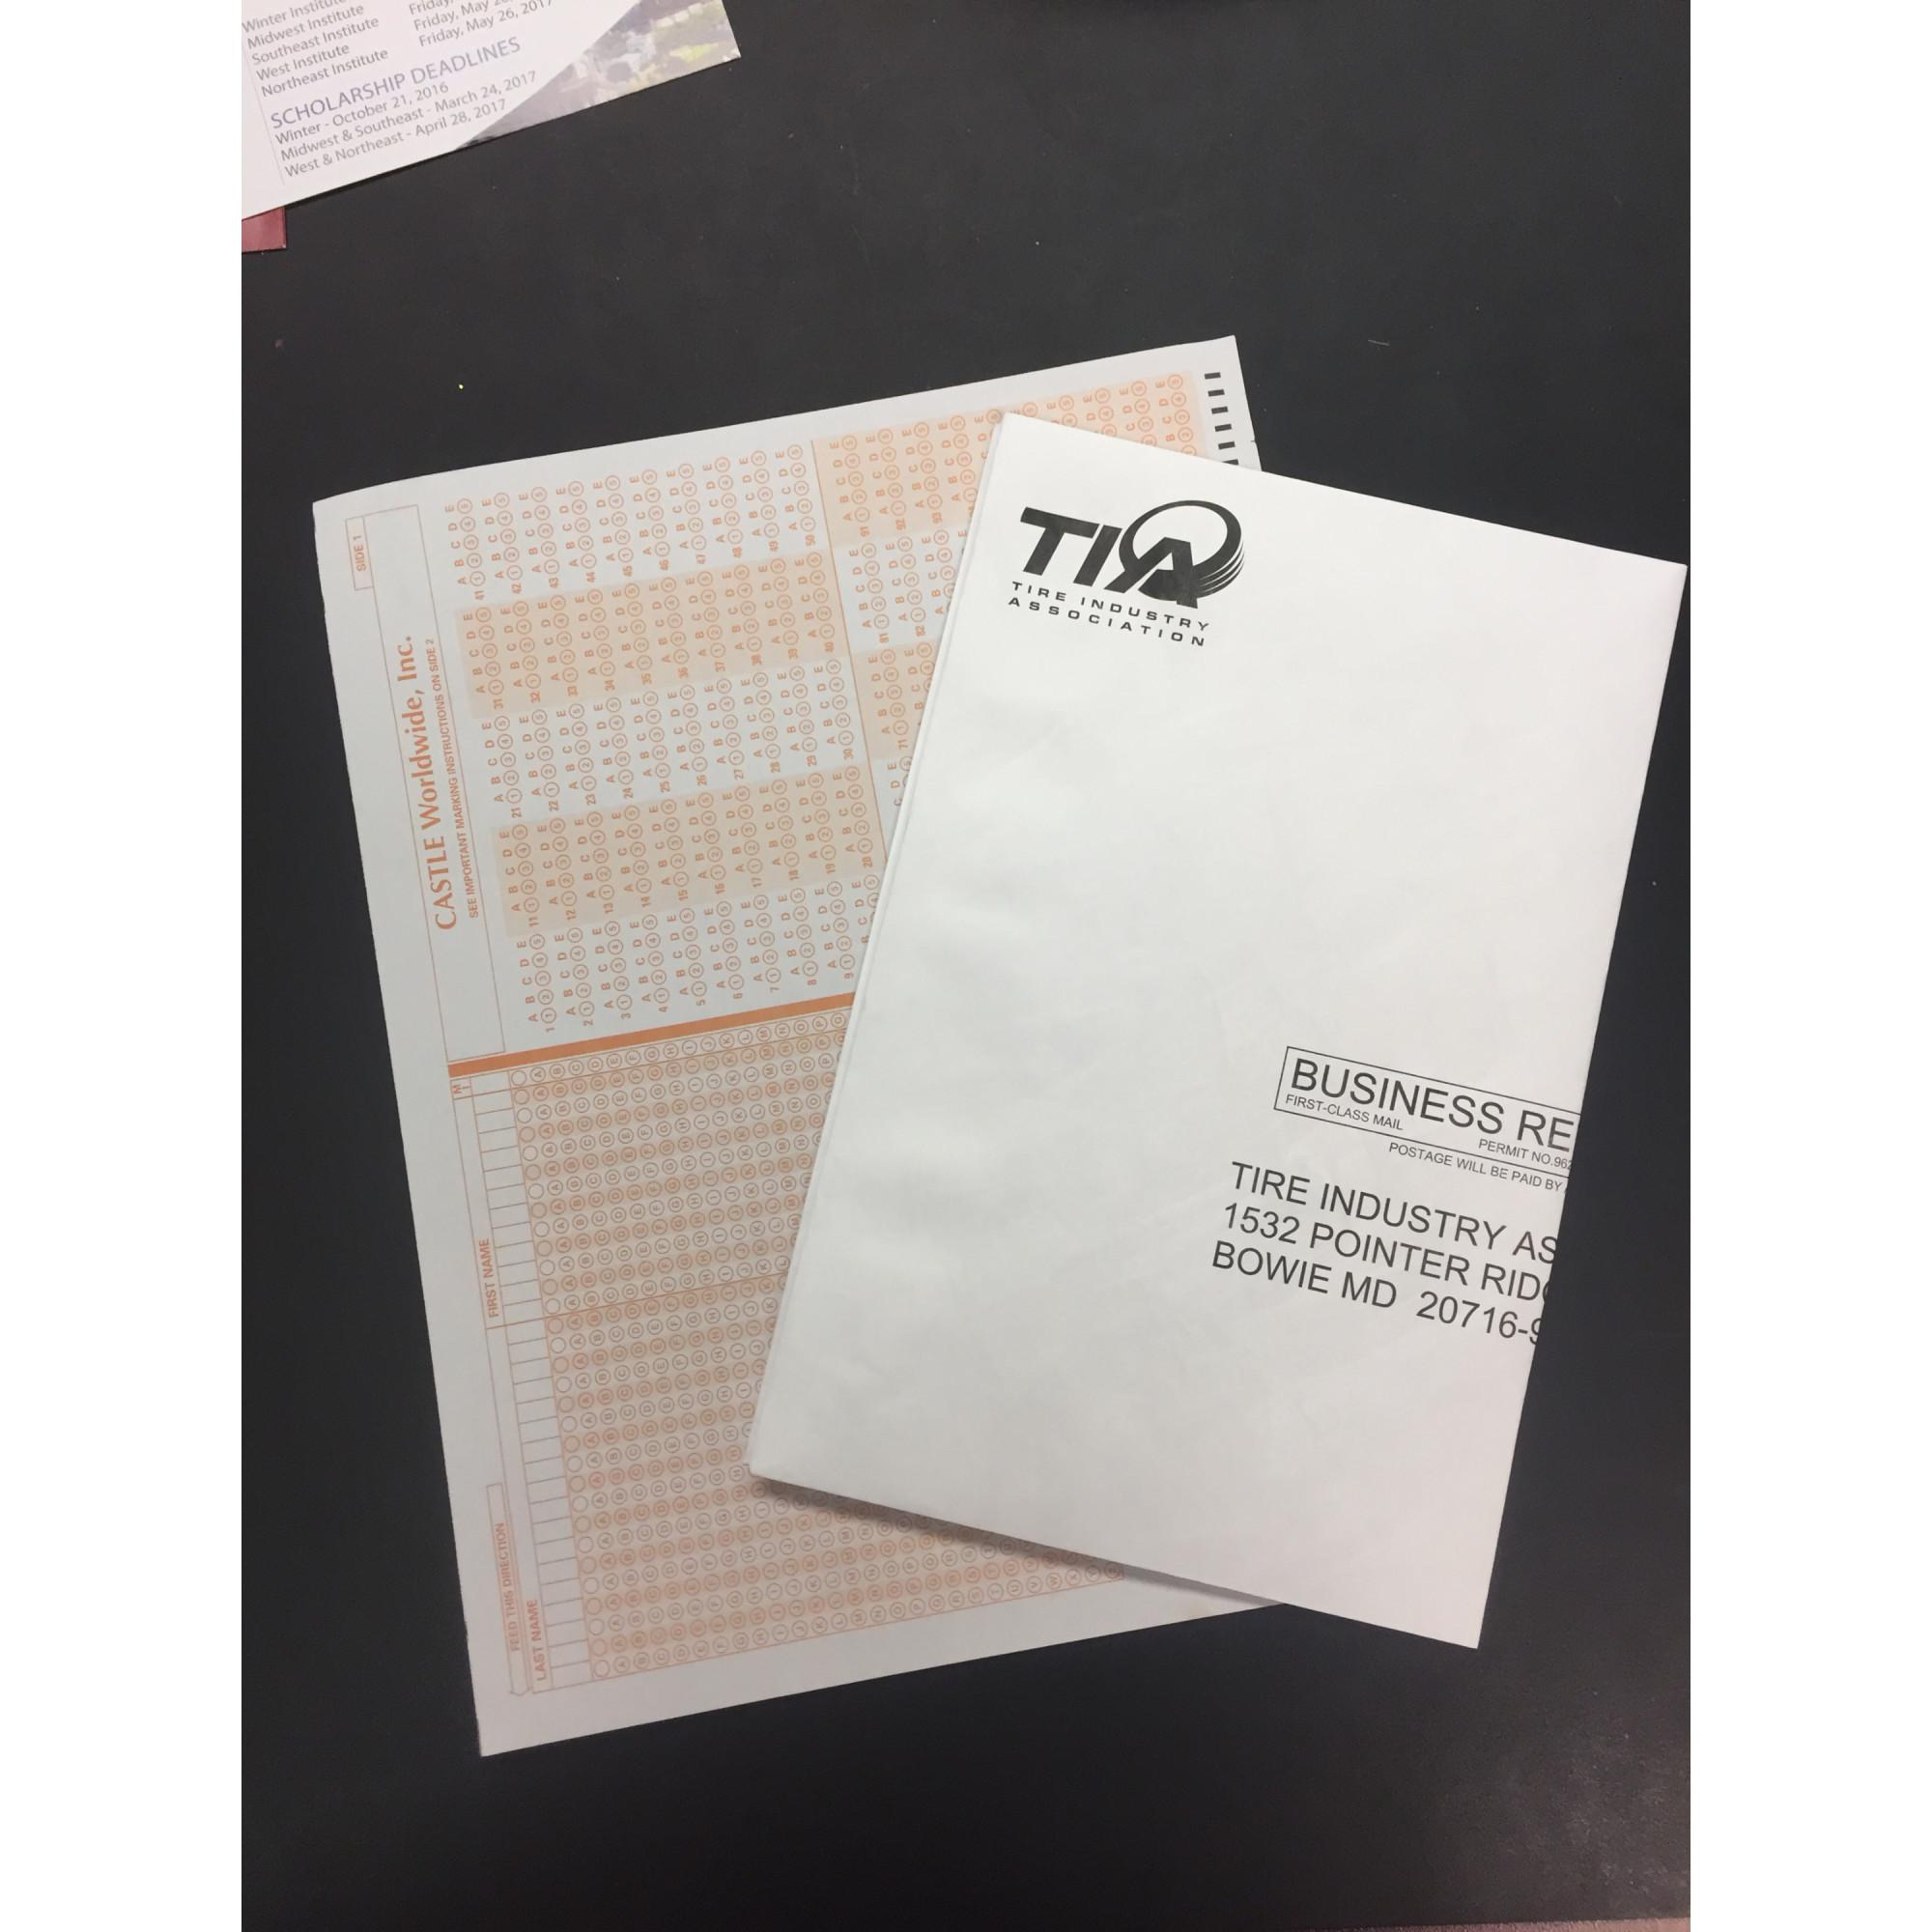 Score sheet and return envelope